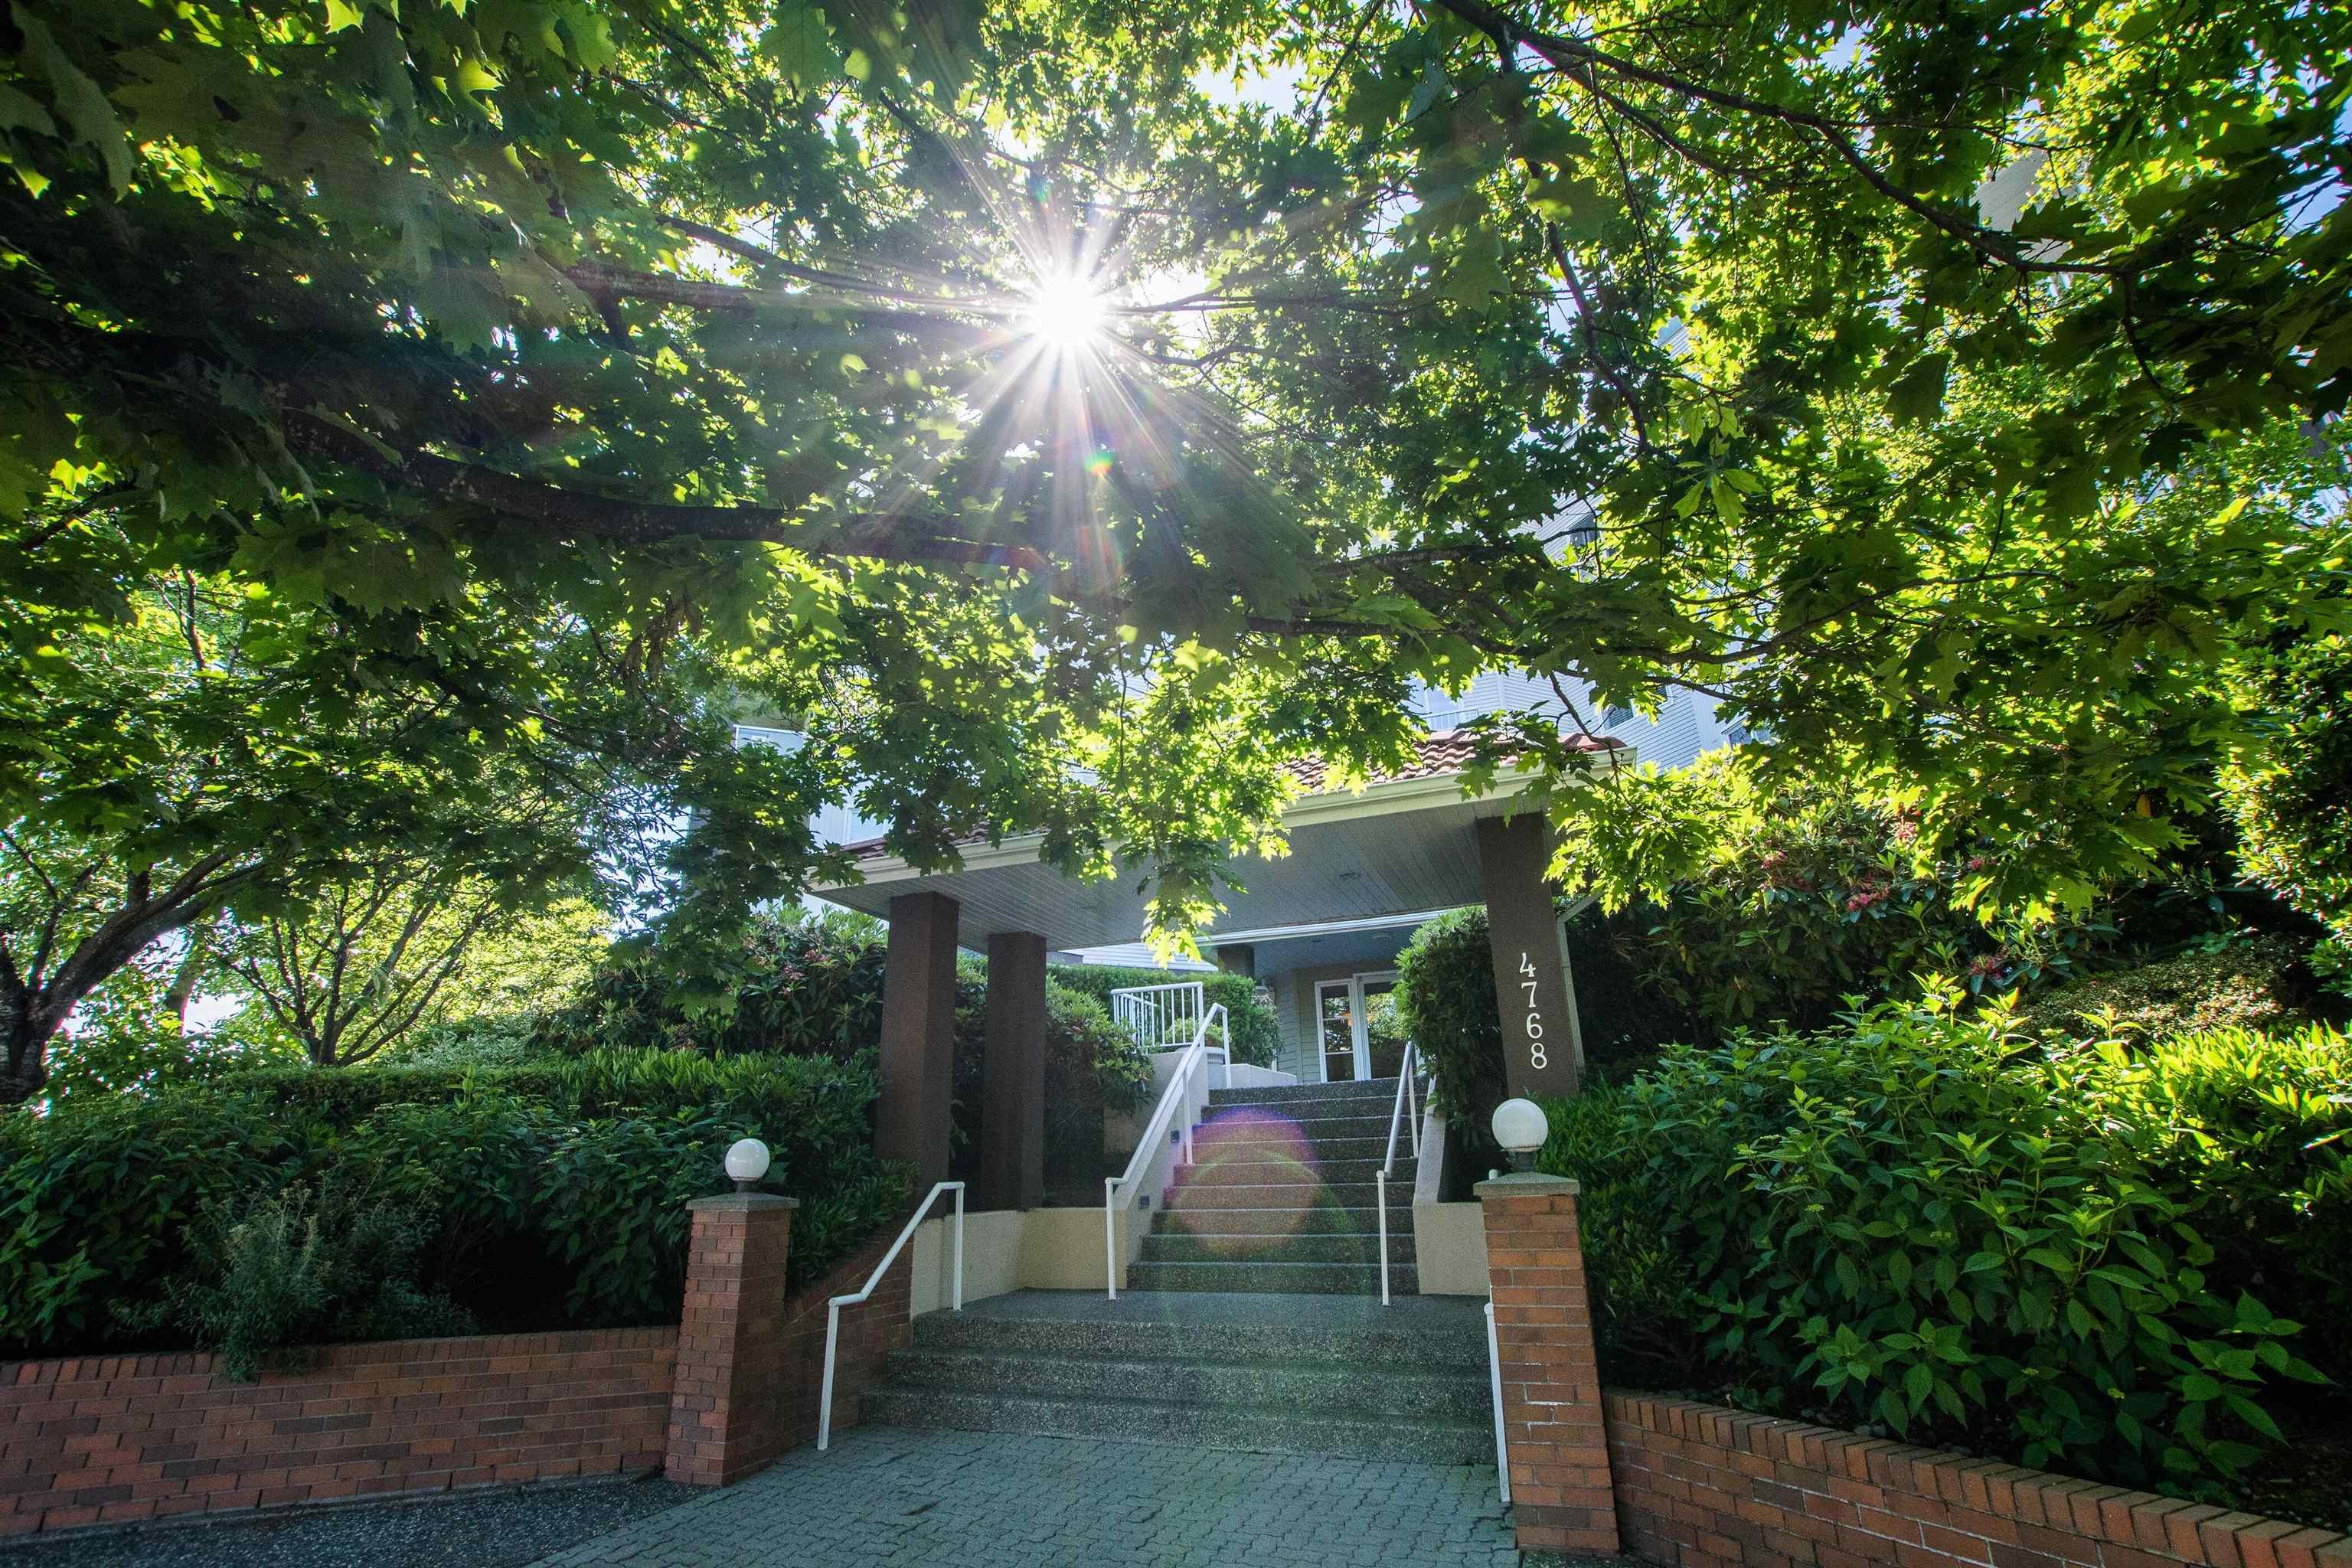 309 4768 53 STREET - Delta Manor Apartment/Condo for sale, 2 Bedrooms (R2624508)